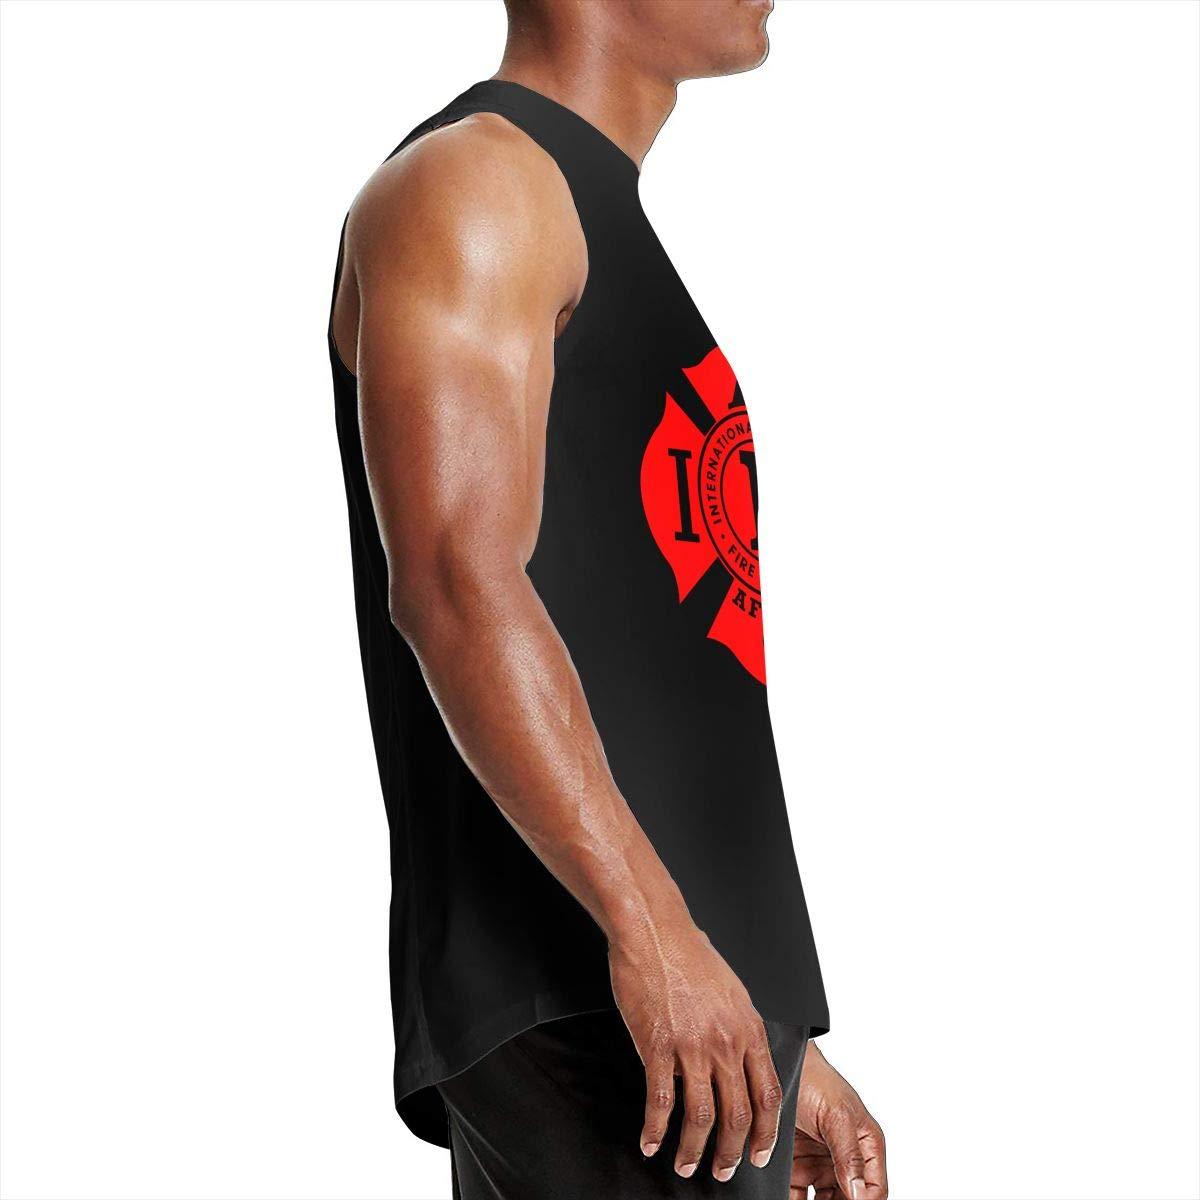 ZETANKK IAFF AFL CIO Fire Firefighter Logo Mens Tank Tops Sleeveless T-Shirt Tee Gym Training Tee